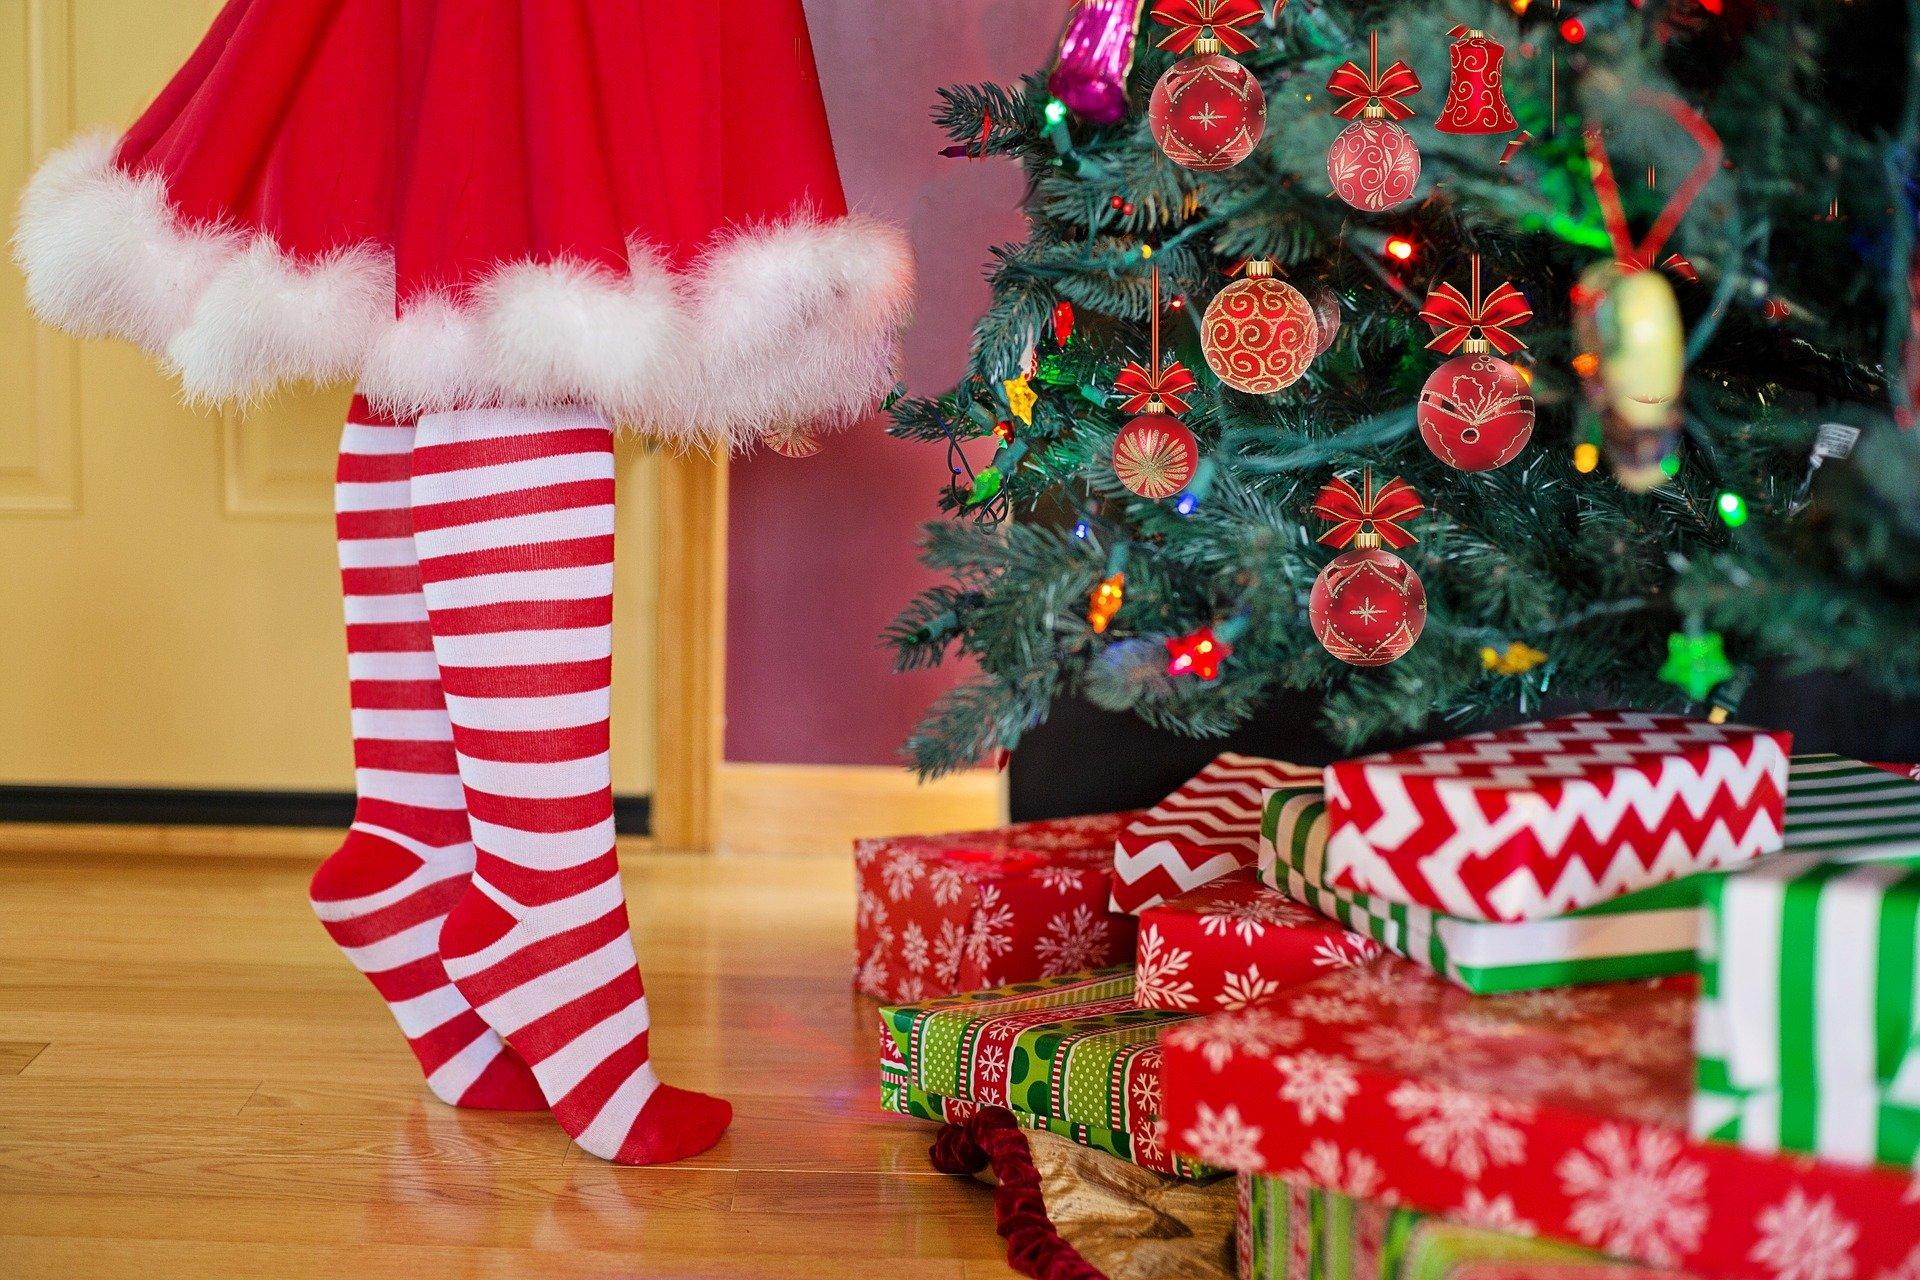 Santa wonderland - 2020 Christmas Events for the Family